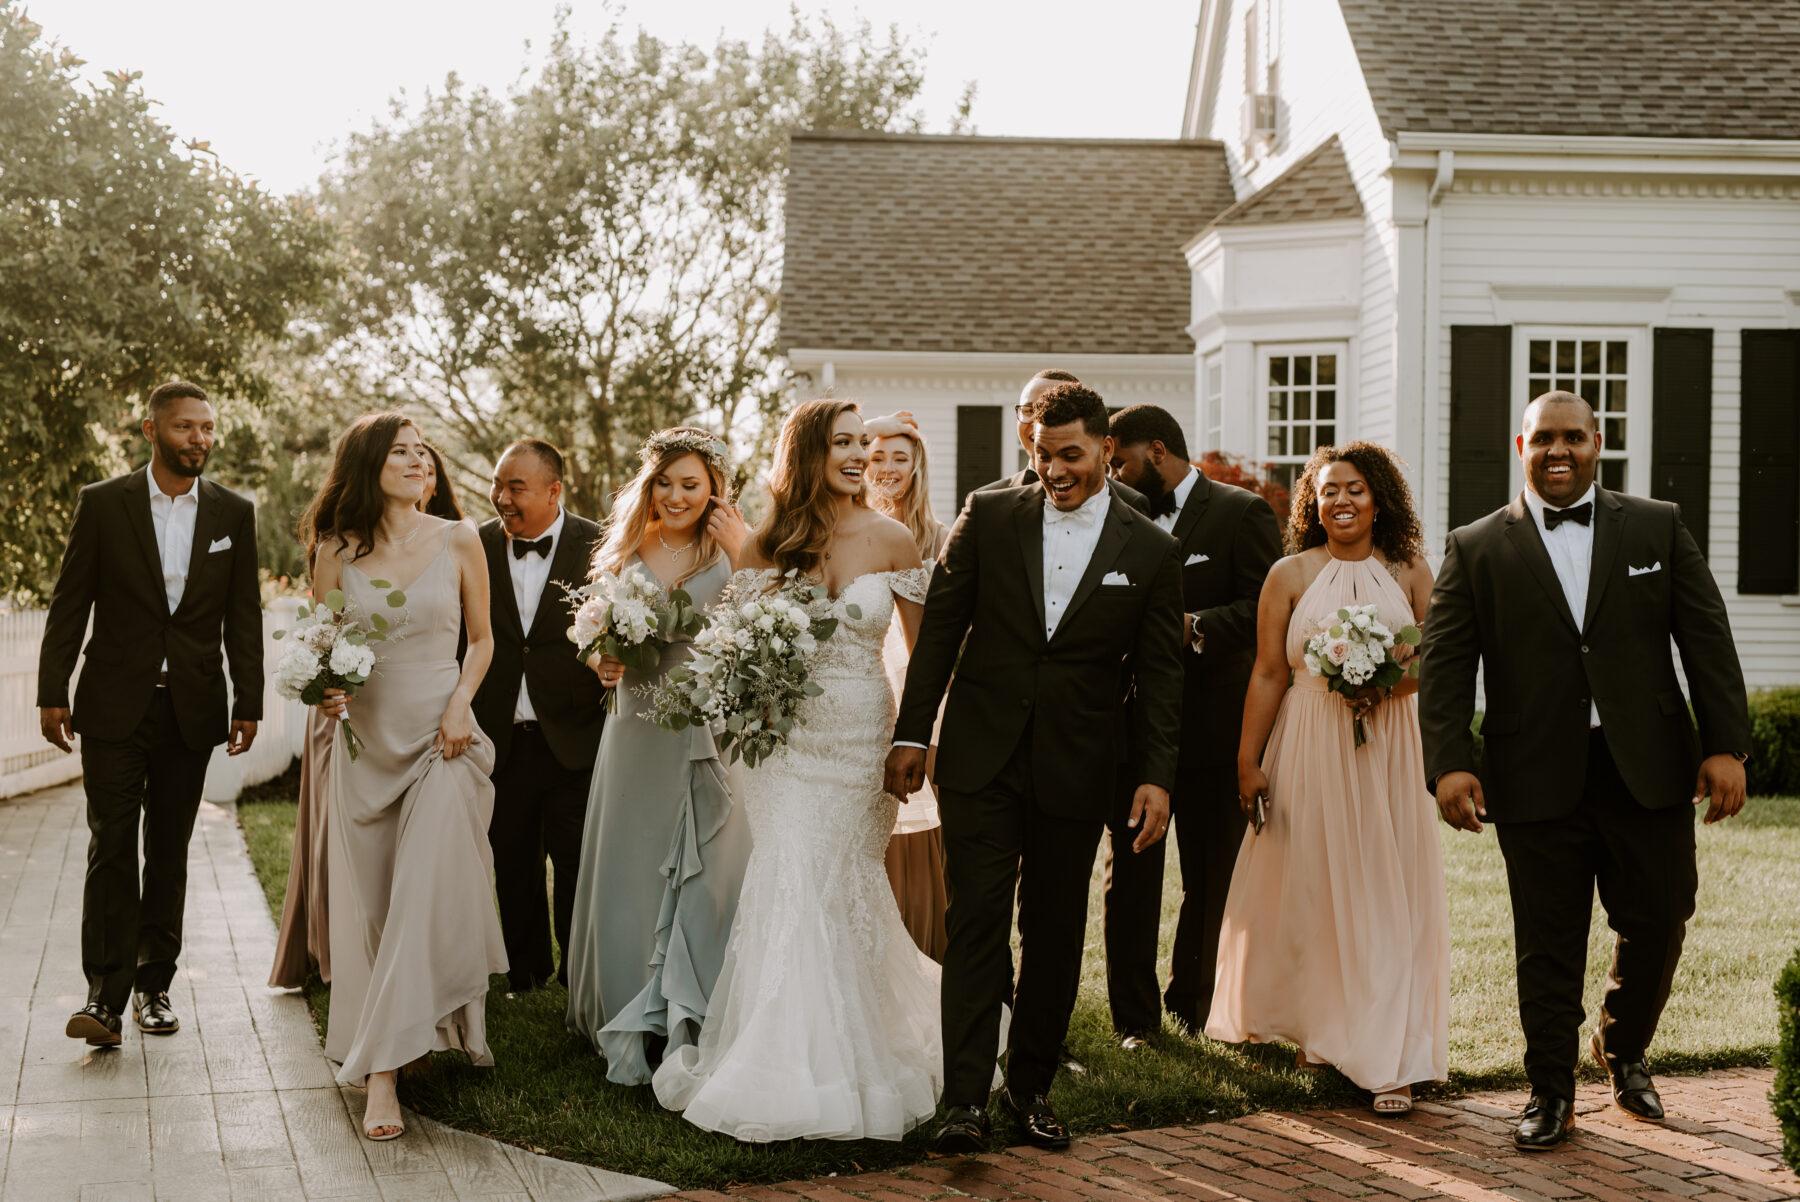 Five Bridge Inn Rehoboth Wedding Katie and Enrique Blueflash Photography 9